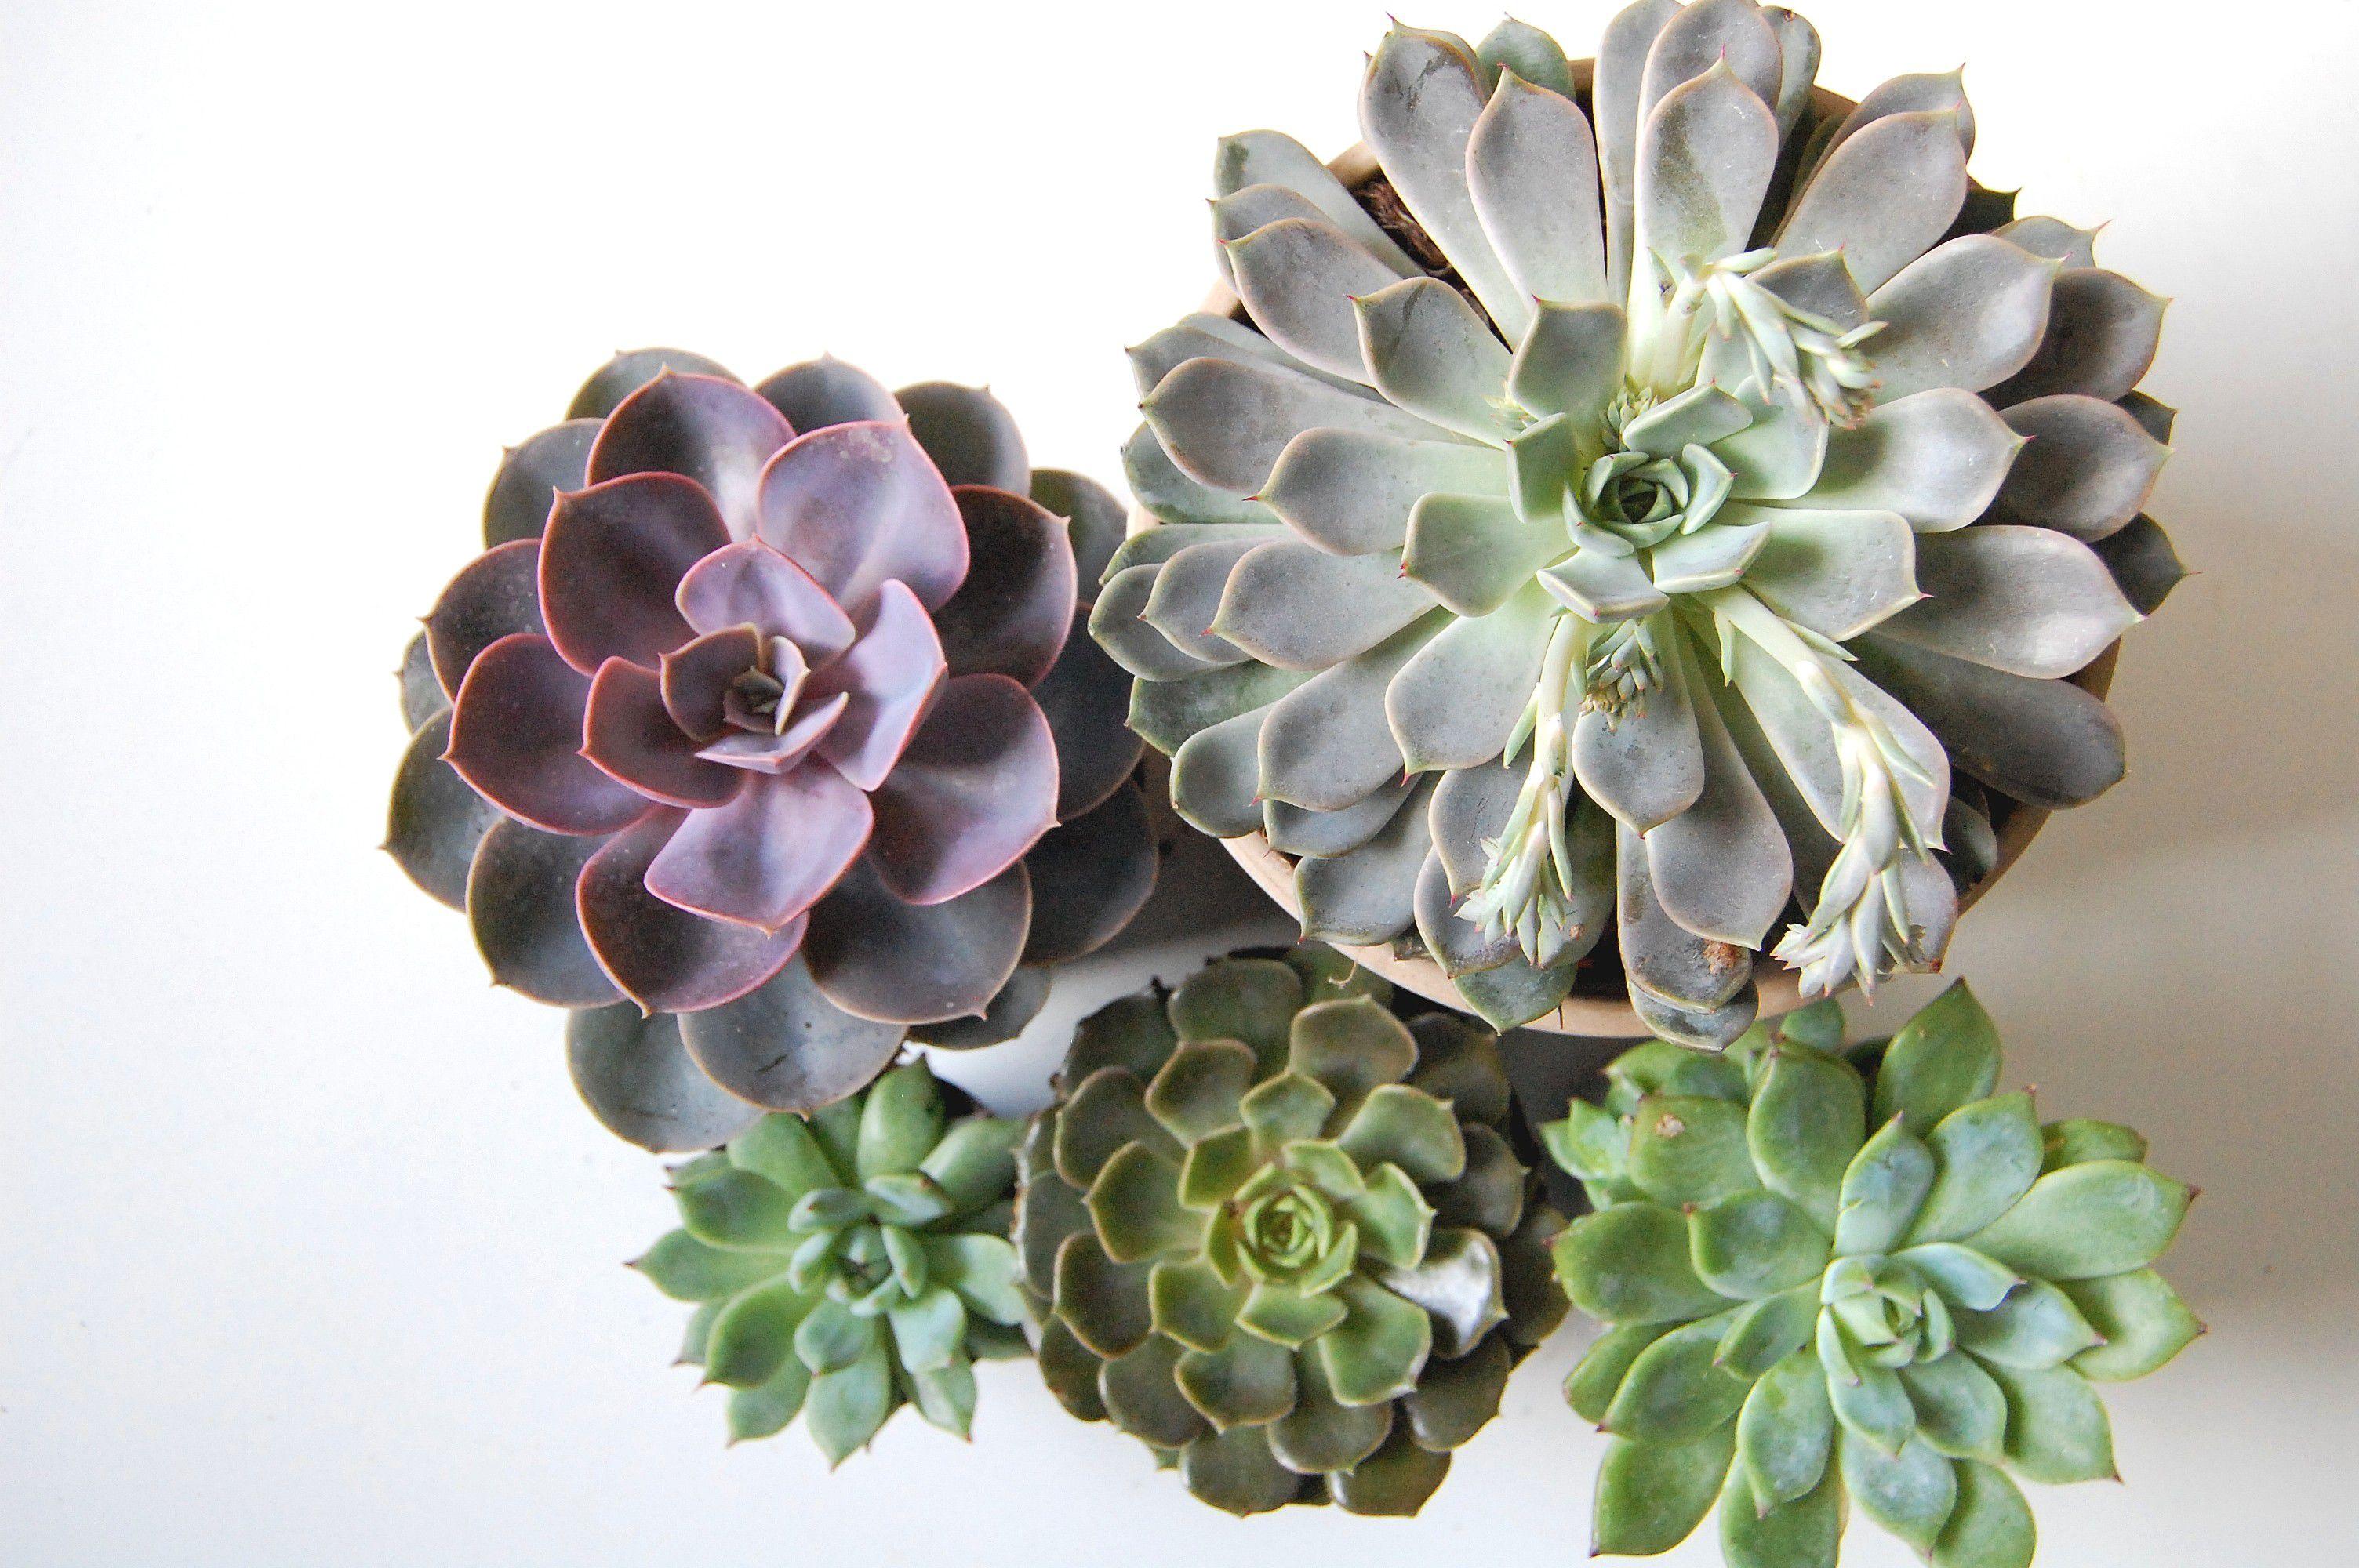 10 Most Popular Types Of Echeveria